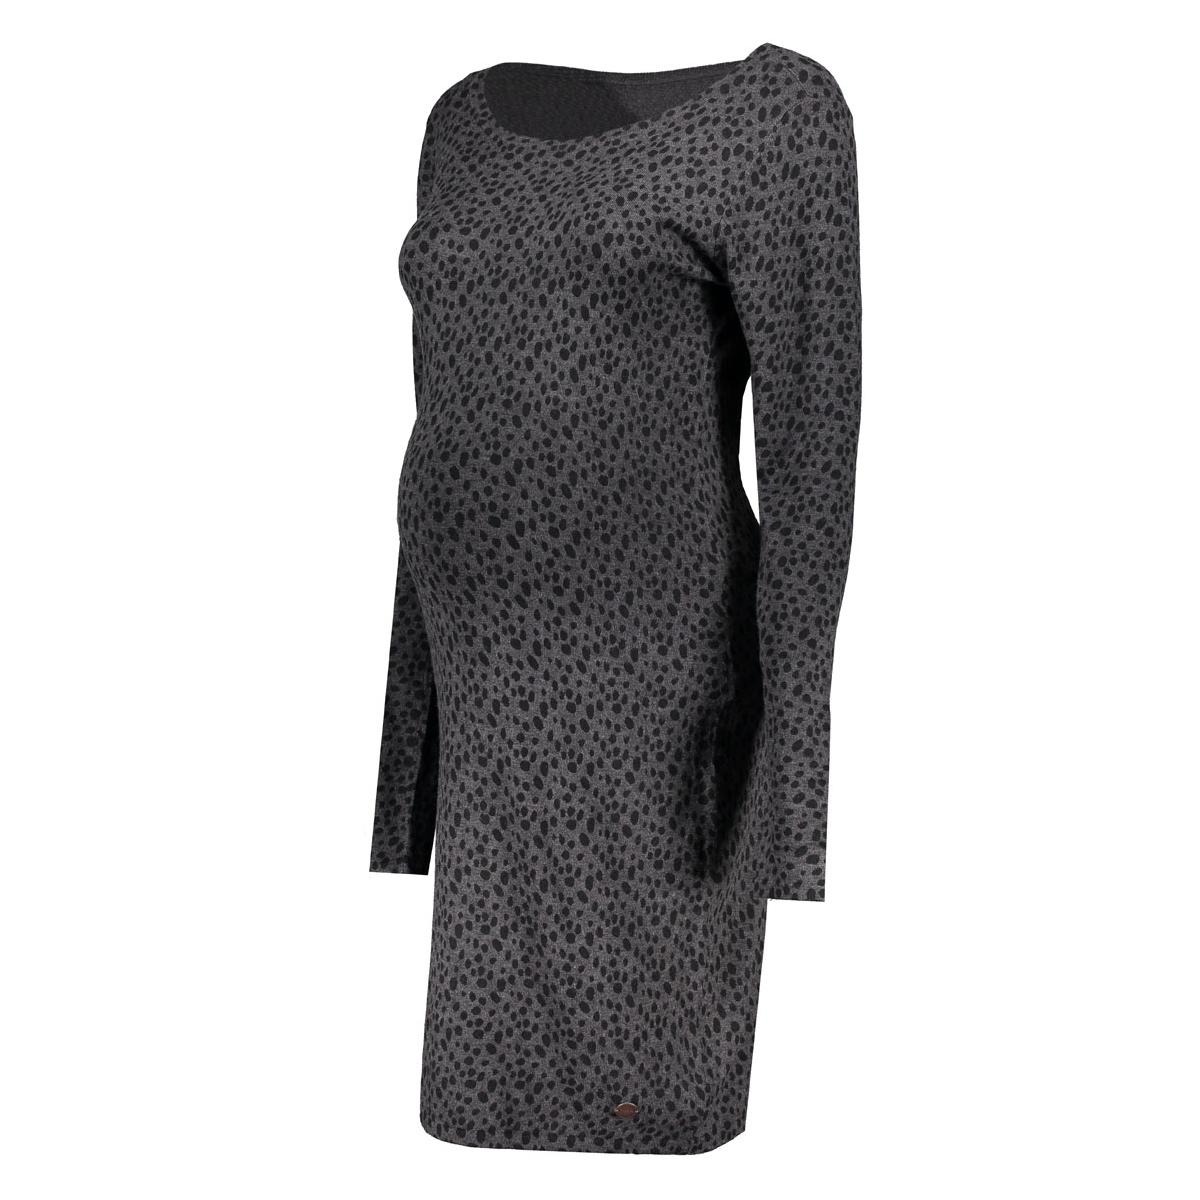 60740 dress kat noppies positie jurk anthracite